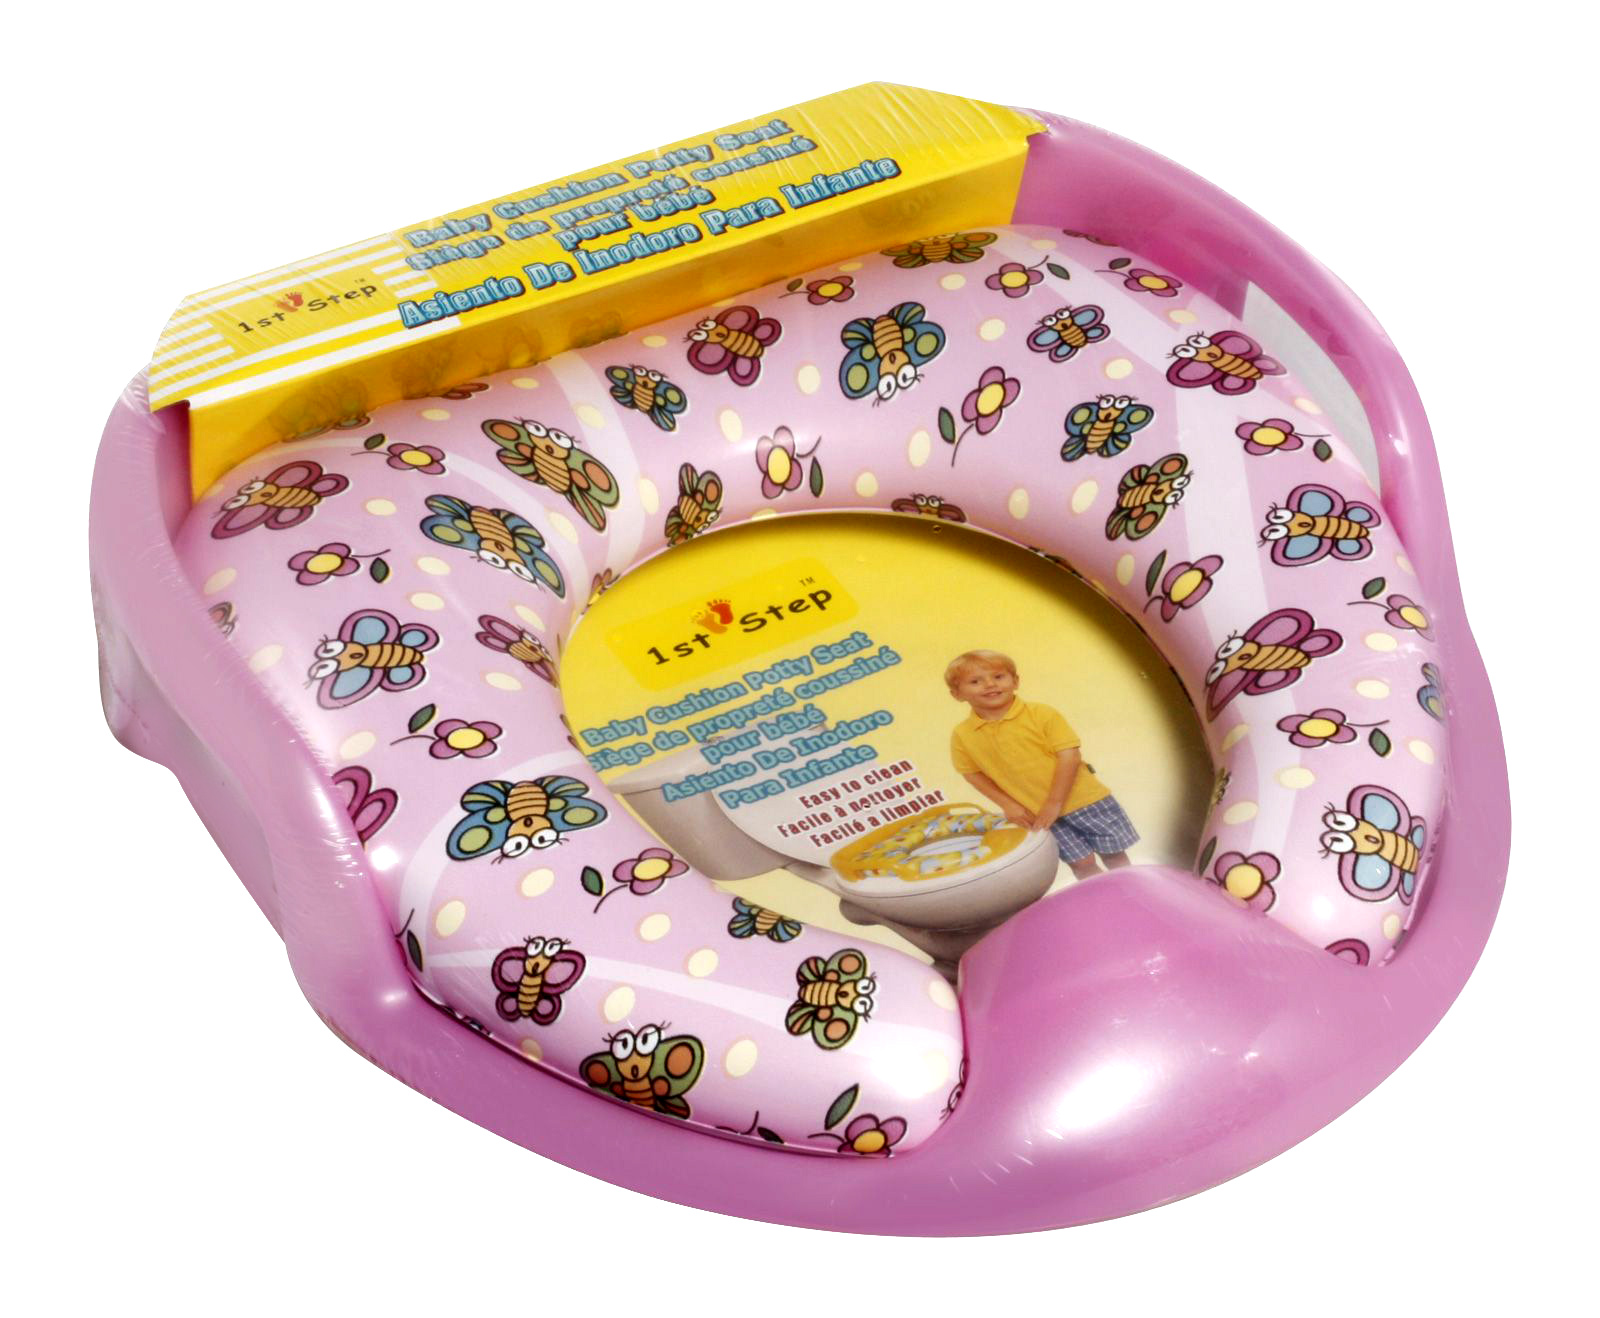 1st Step Baby Cushion Potty Set